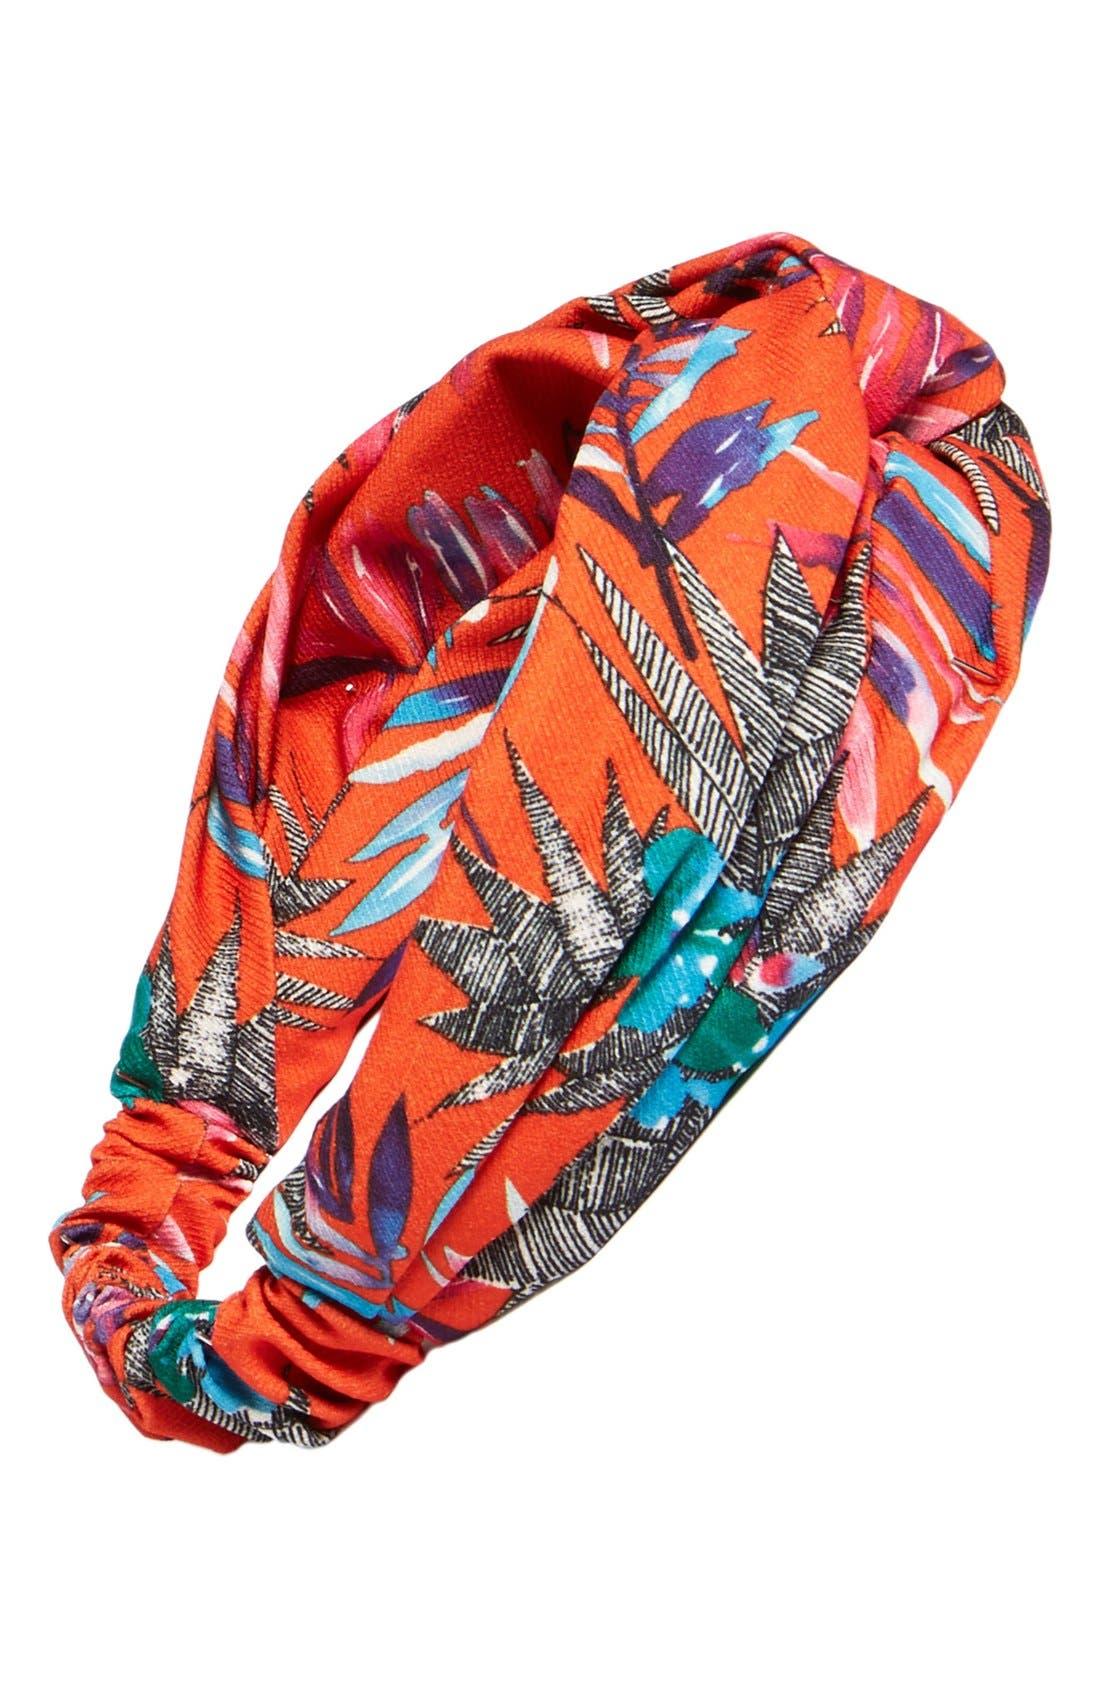 Alternate Image 1 Selected - Eugenia Kim Tropical Print Turban Headband